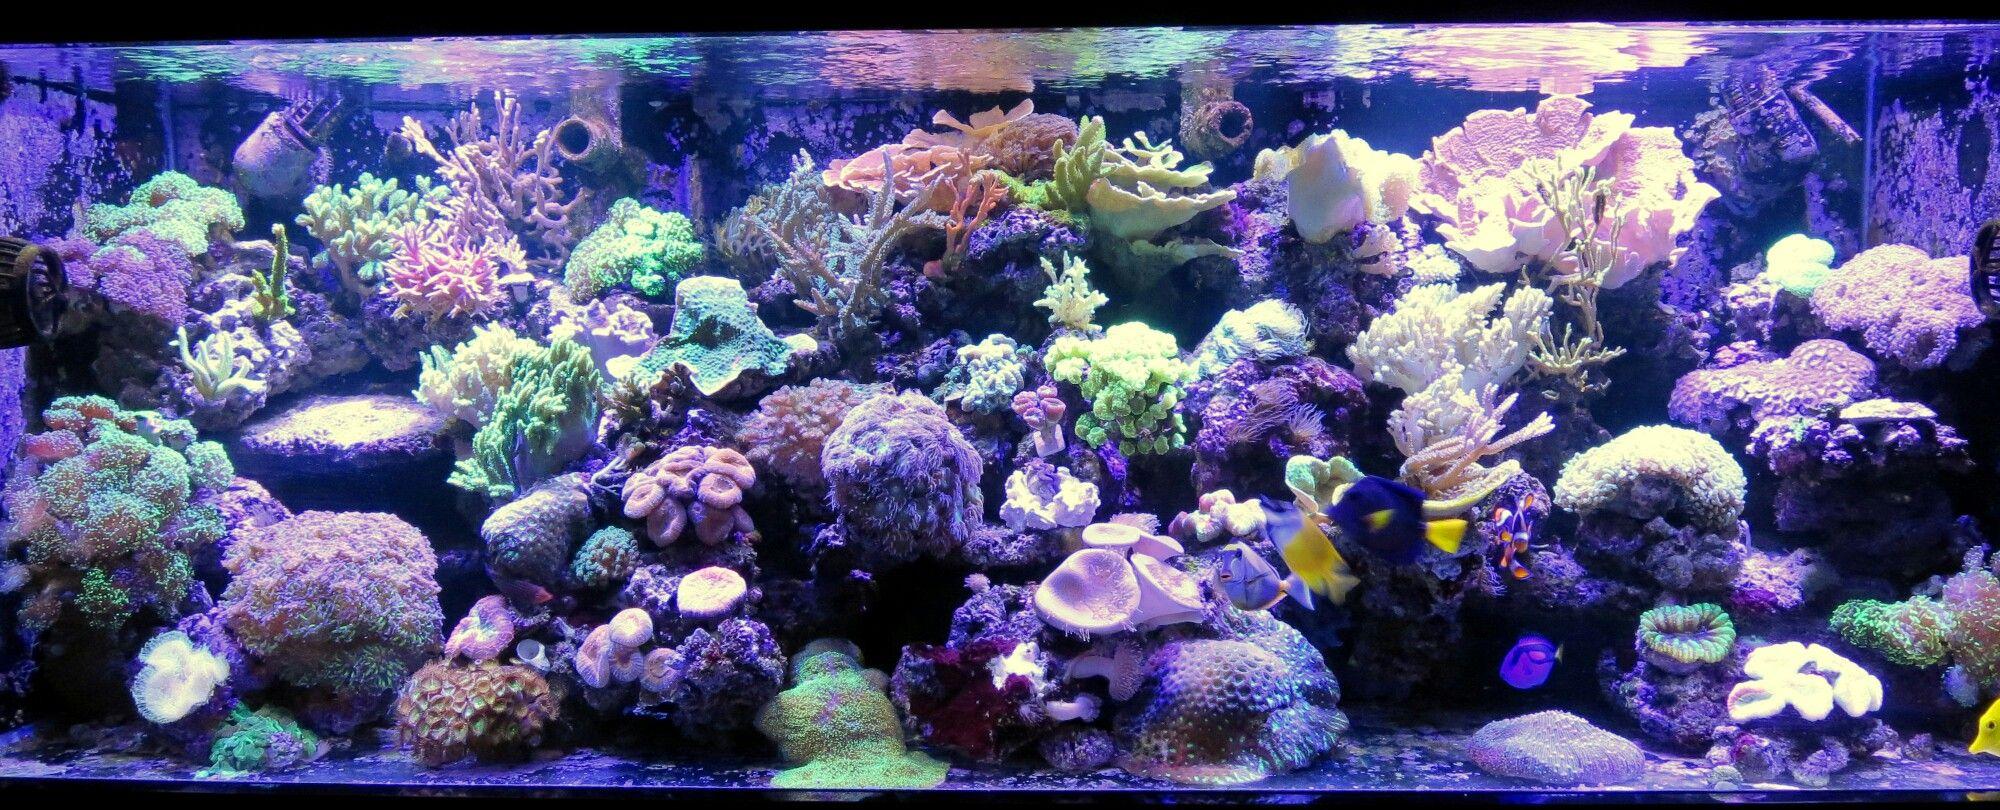 ec11e877e052 400 gallon bio-active coral and anemone reef tank with blue tang ...